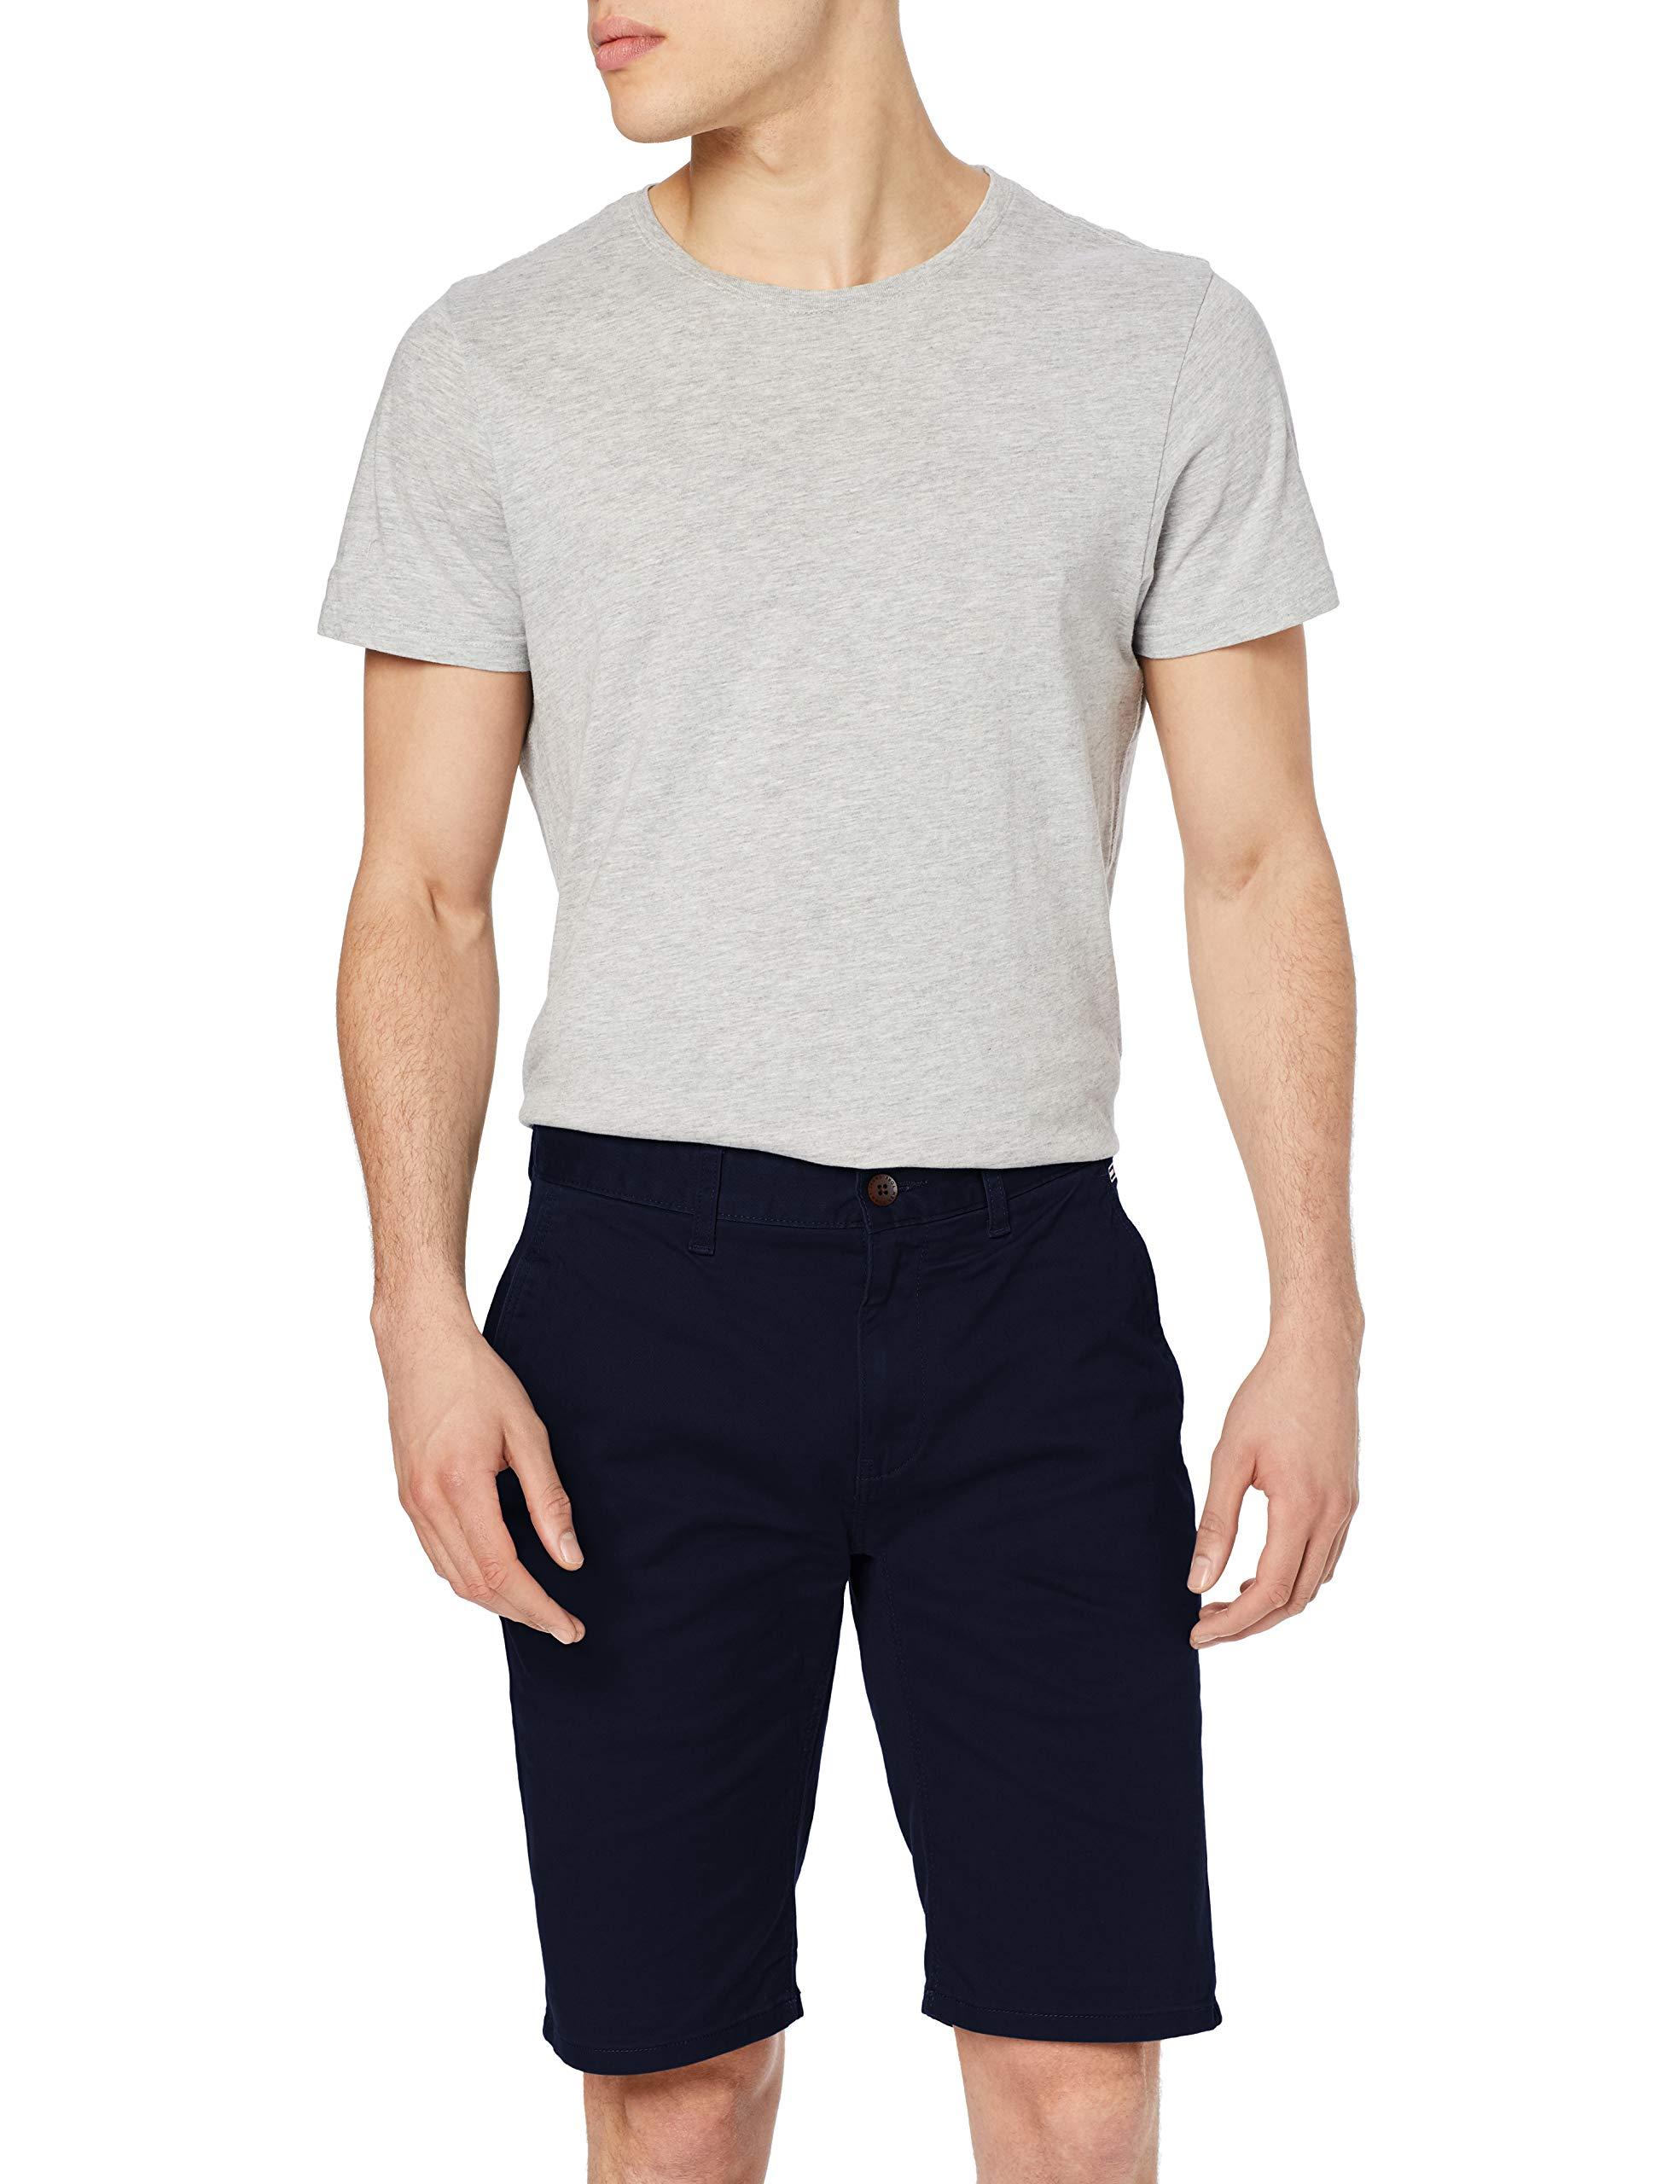 Tommy Hilfiger Tjm Iris 002W29 ShortBleublack Jeans Denim Essential l32taille FabricantNi29Homme Chino xodCBe